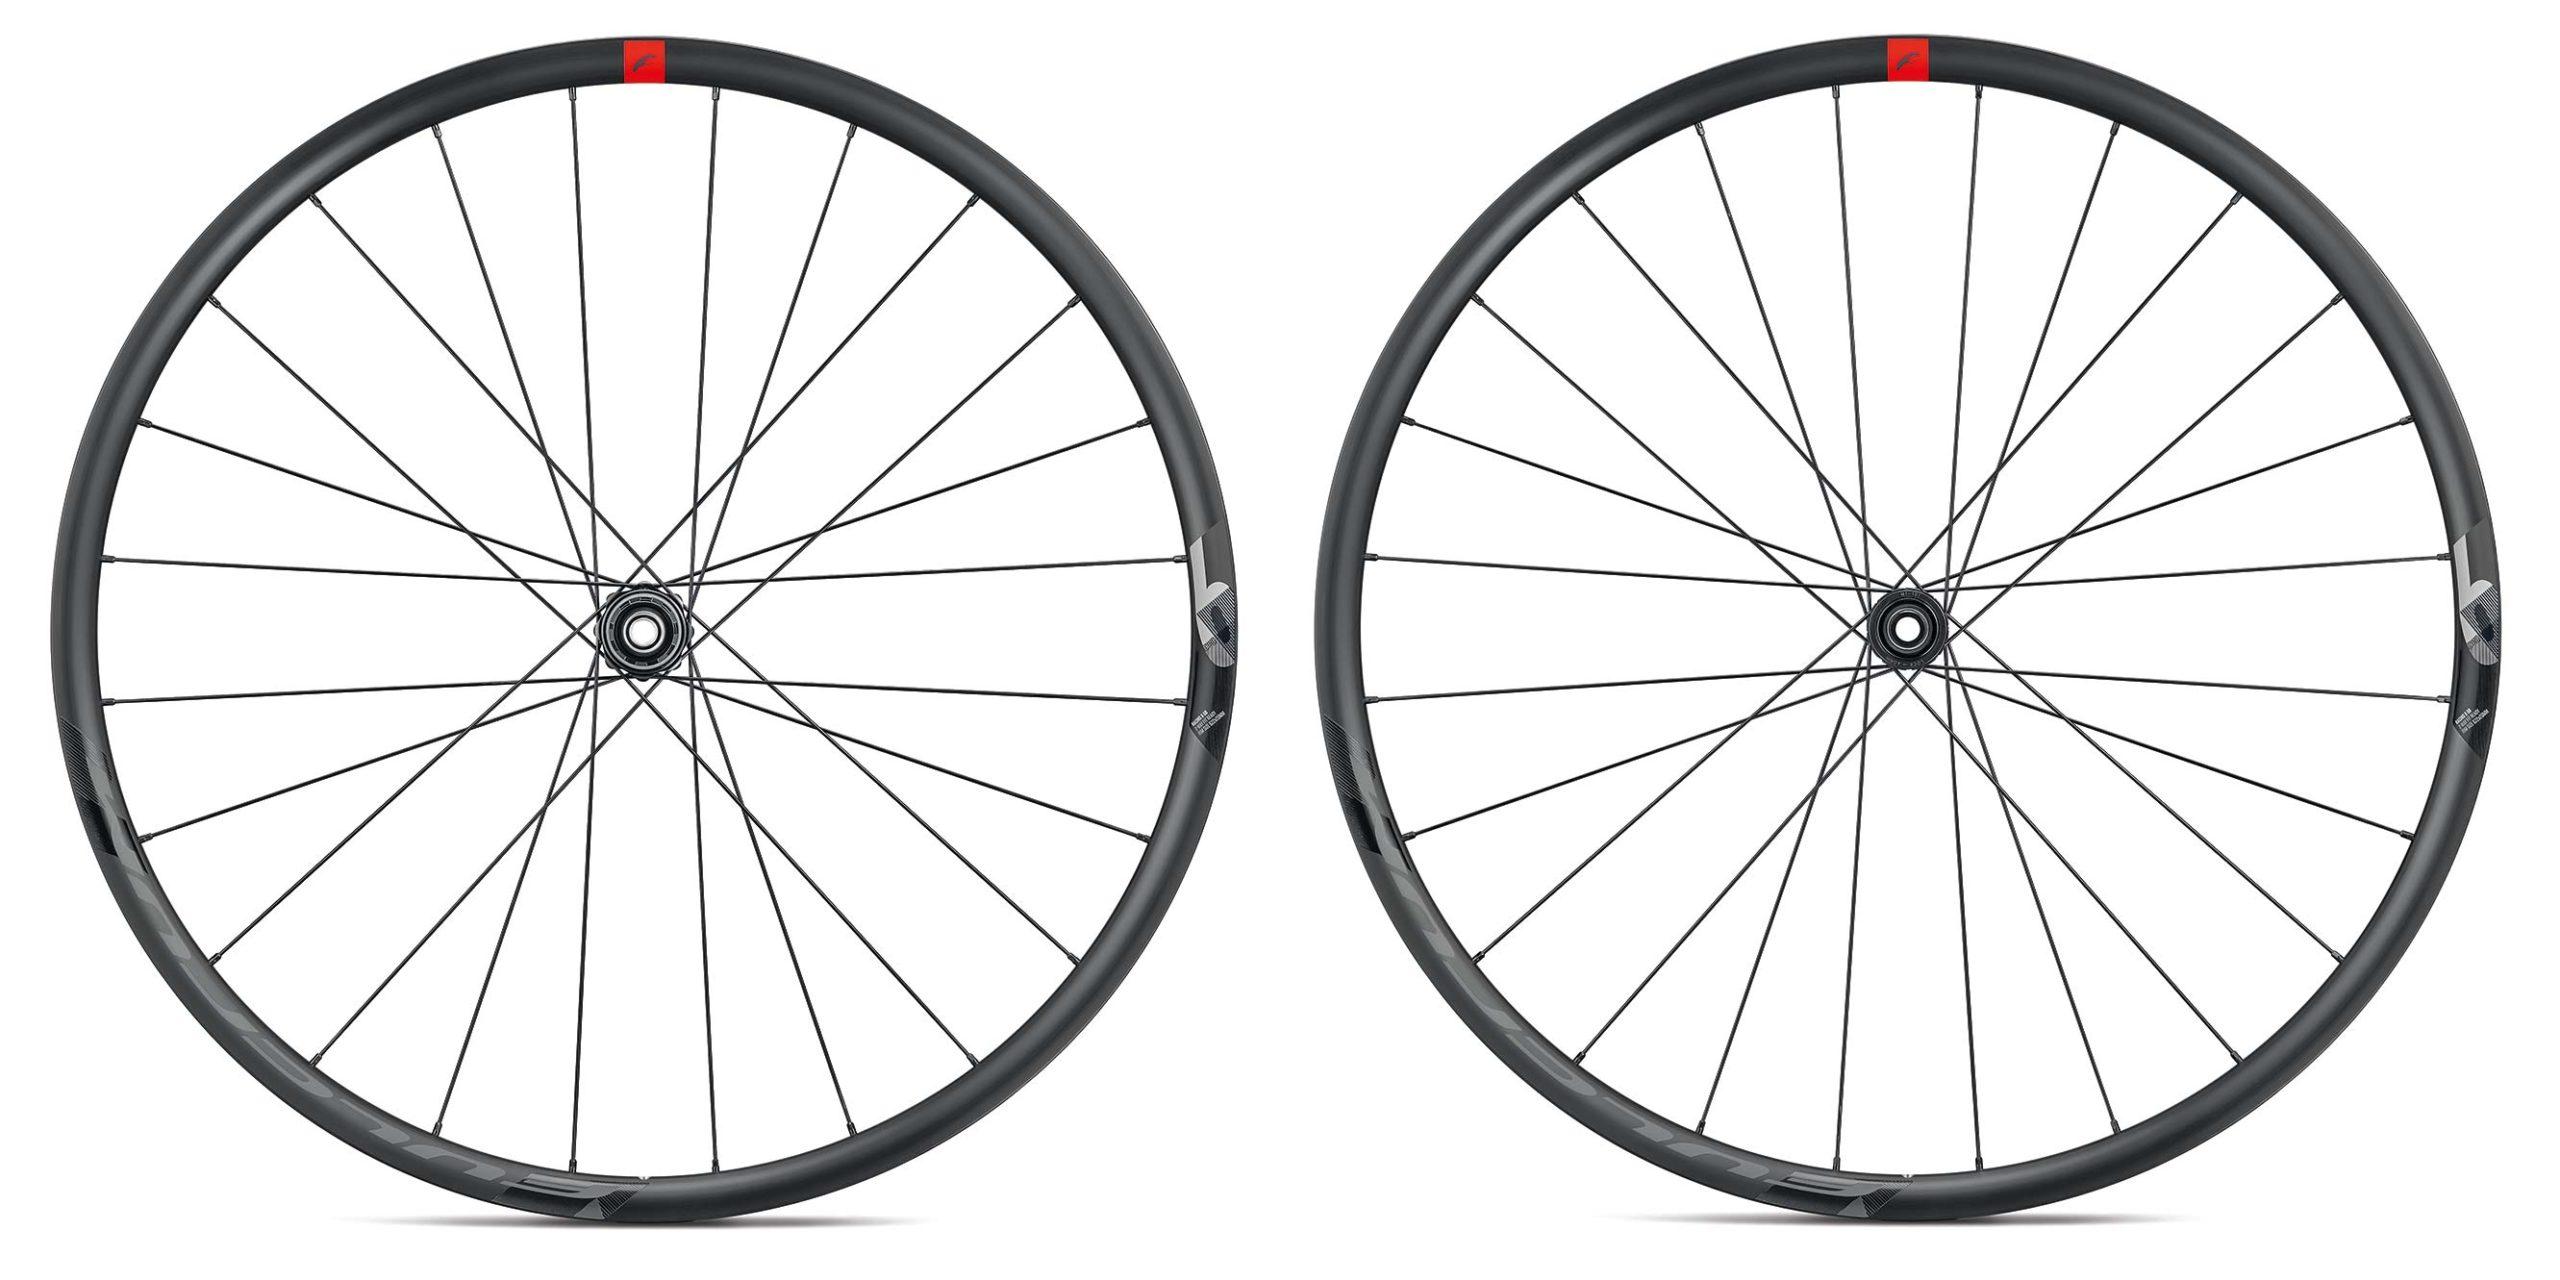 2022 Fulcrum Racing 4 5 6 DB alloy road wheels, affordable aluminum tubeless gravel all road bike disc brake wheelset,